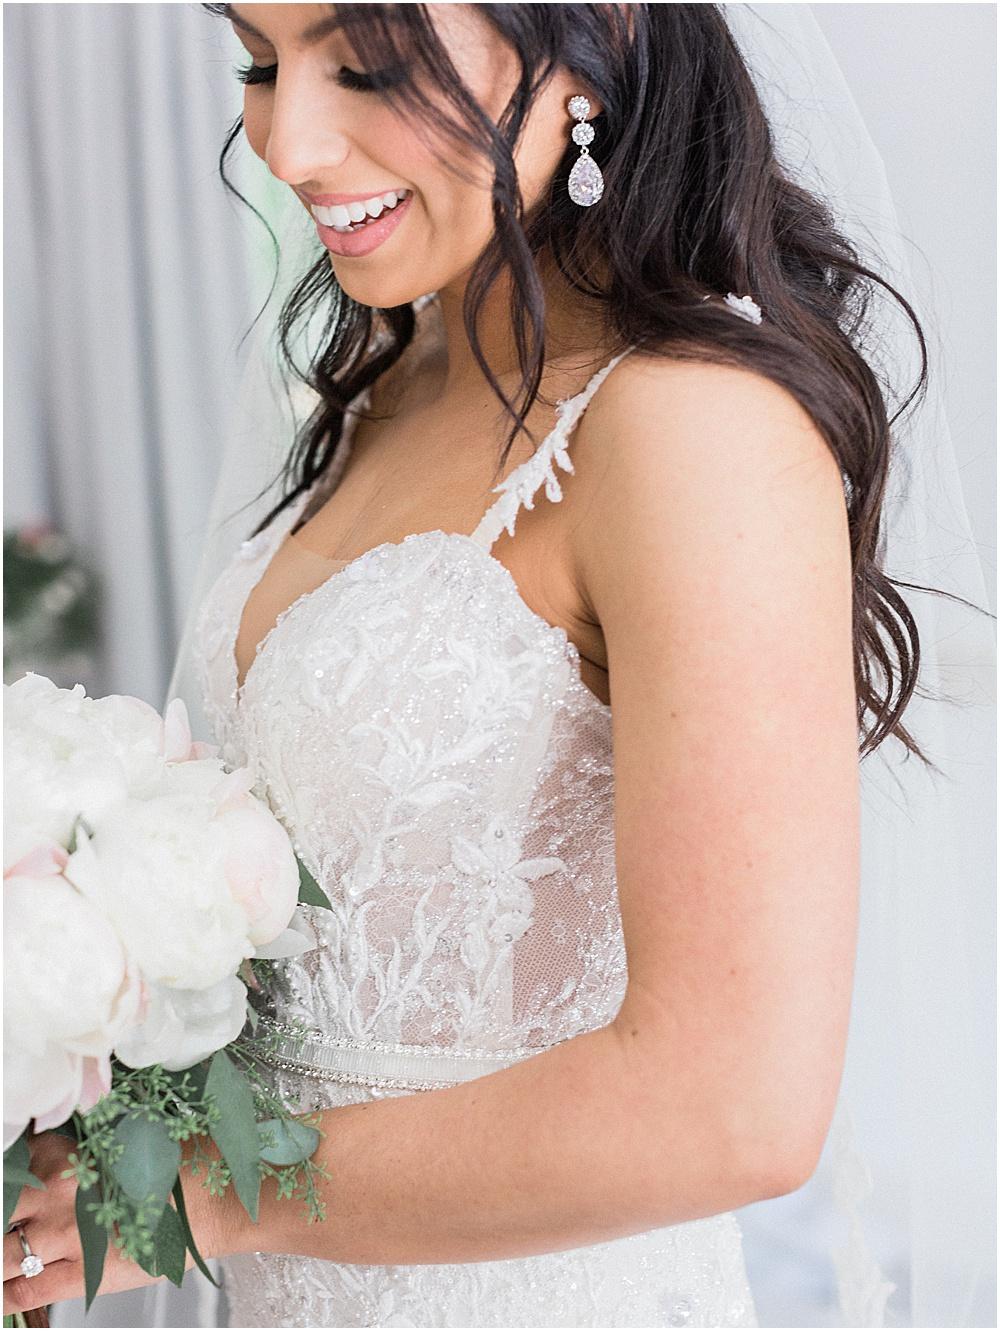 beauport_hotel_gloucester_lebanese_blush_sparkle_design_studio_odette_najib_cedars_hummus_massachusetts_boston_wedding_photographer_meredith_jane_photography_photo_0495.jpg